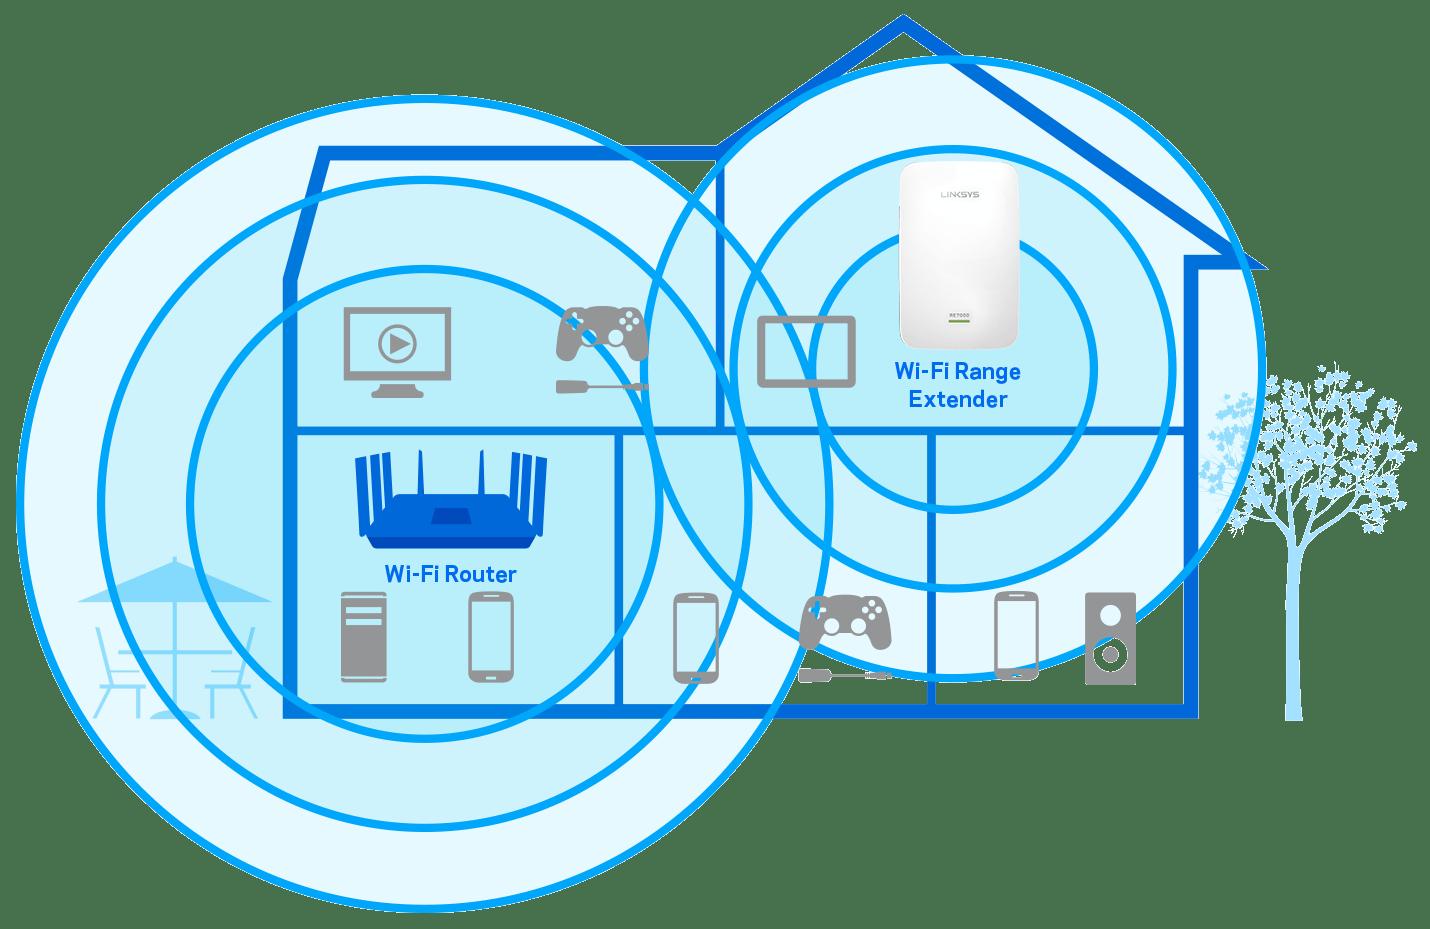 wireless extender diagram ez go what is a wi fi range